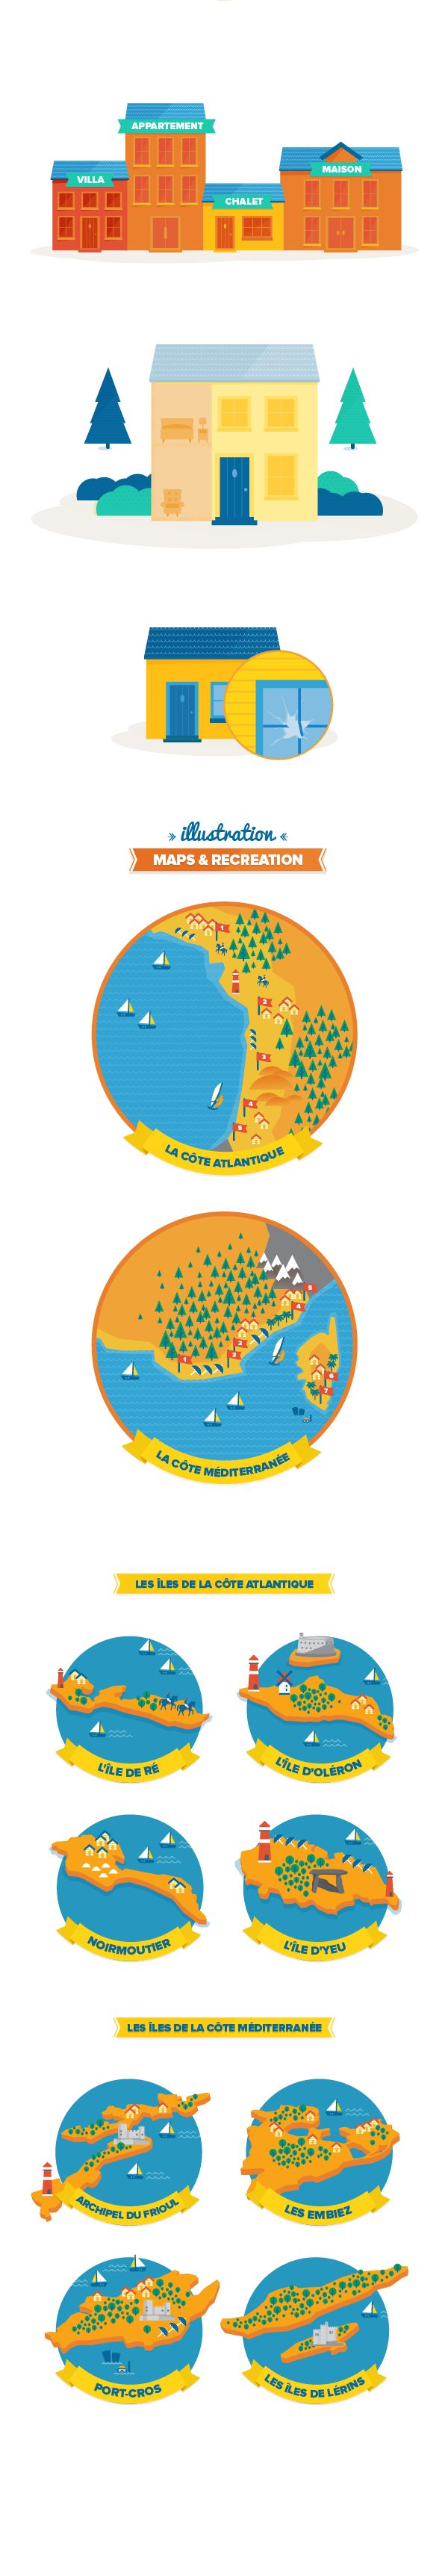 Poplidays Infographics by DHNN Creative Agency , via Behance